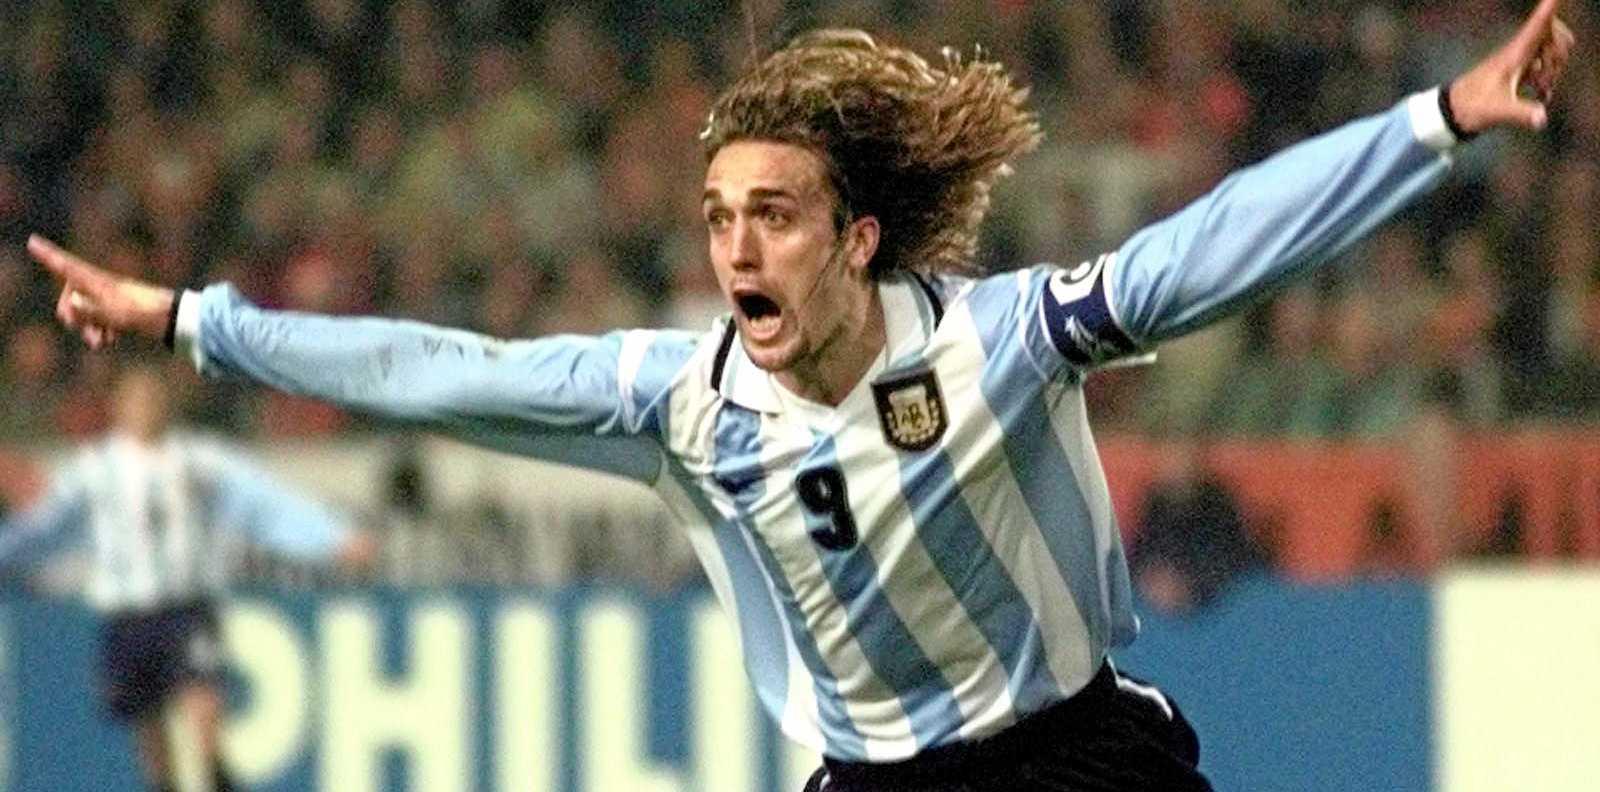 Gabriel Batistuta celebrates after scoring for Argentina in 1999.